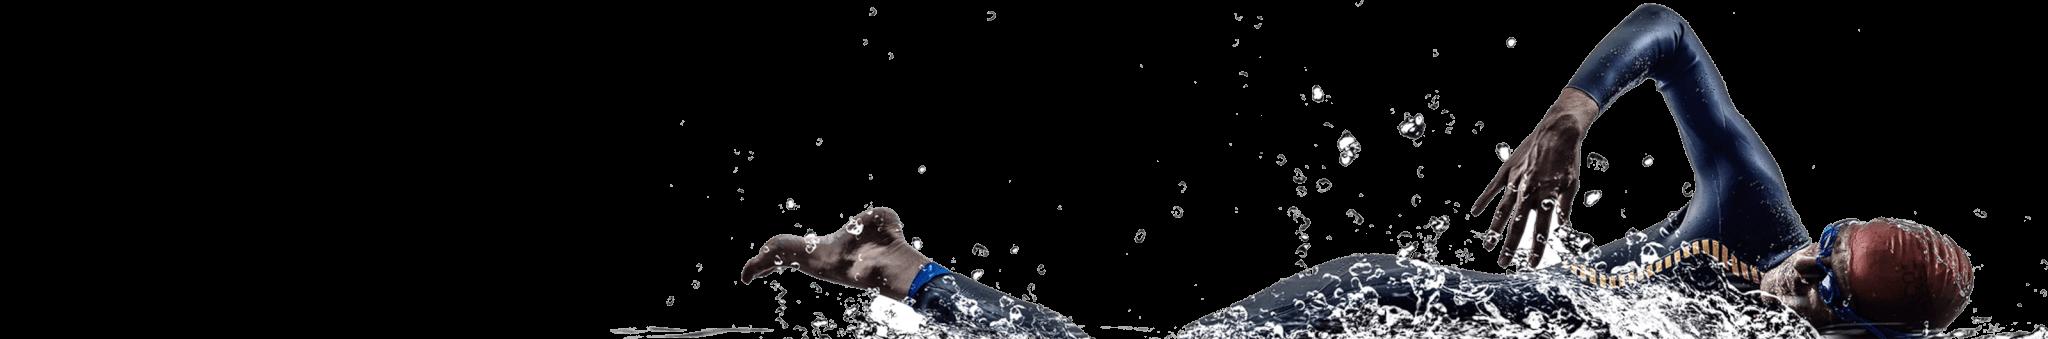 https://aquae.grand-dax.fr/wp-content/uploads/sites/4/2017/10/inner_swimmer.png